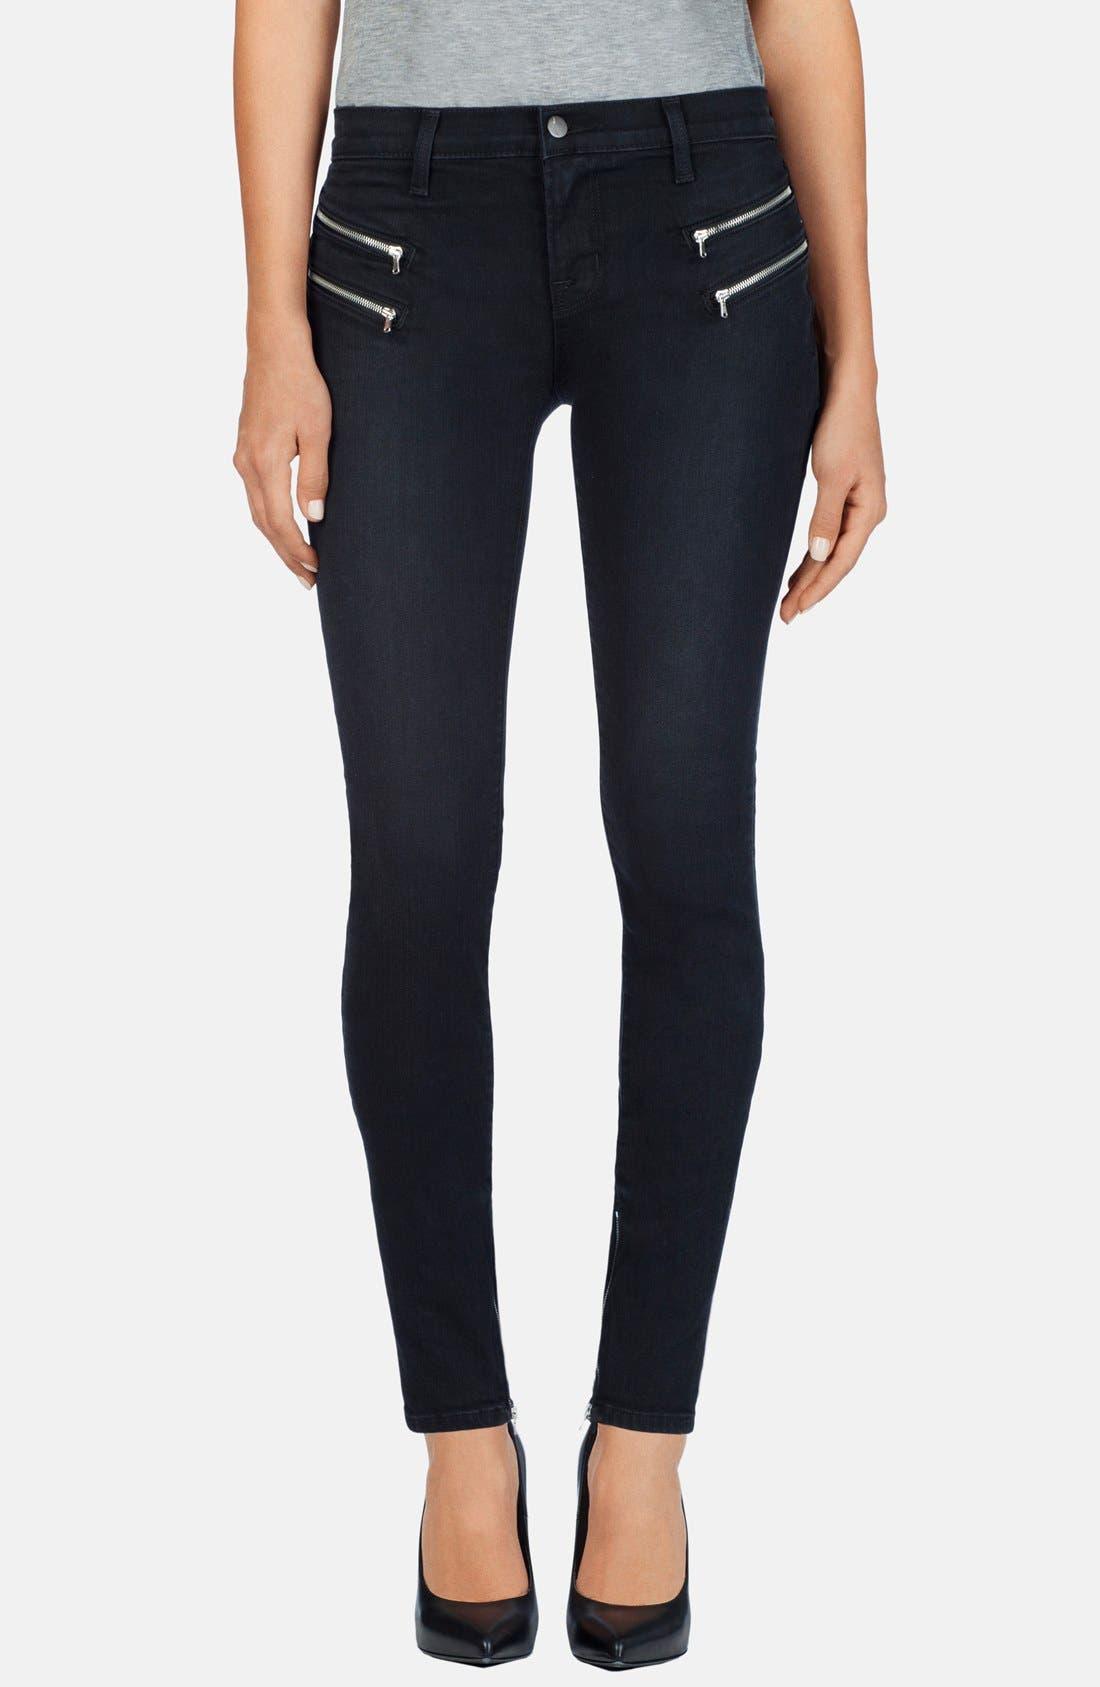 Main Image - J Brand 'Cass' Zip Skinny Jeans (Digital)